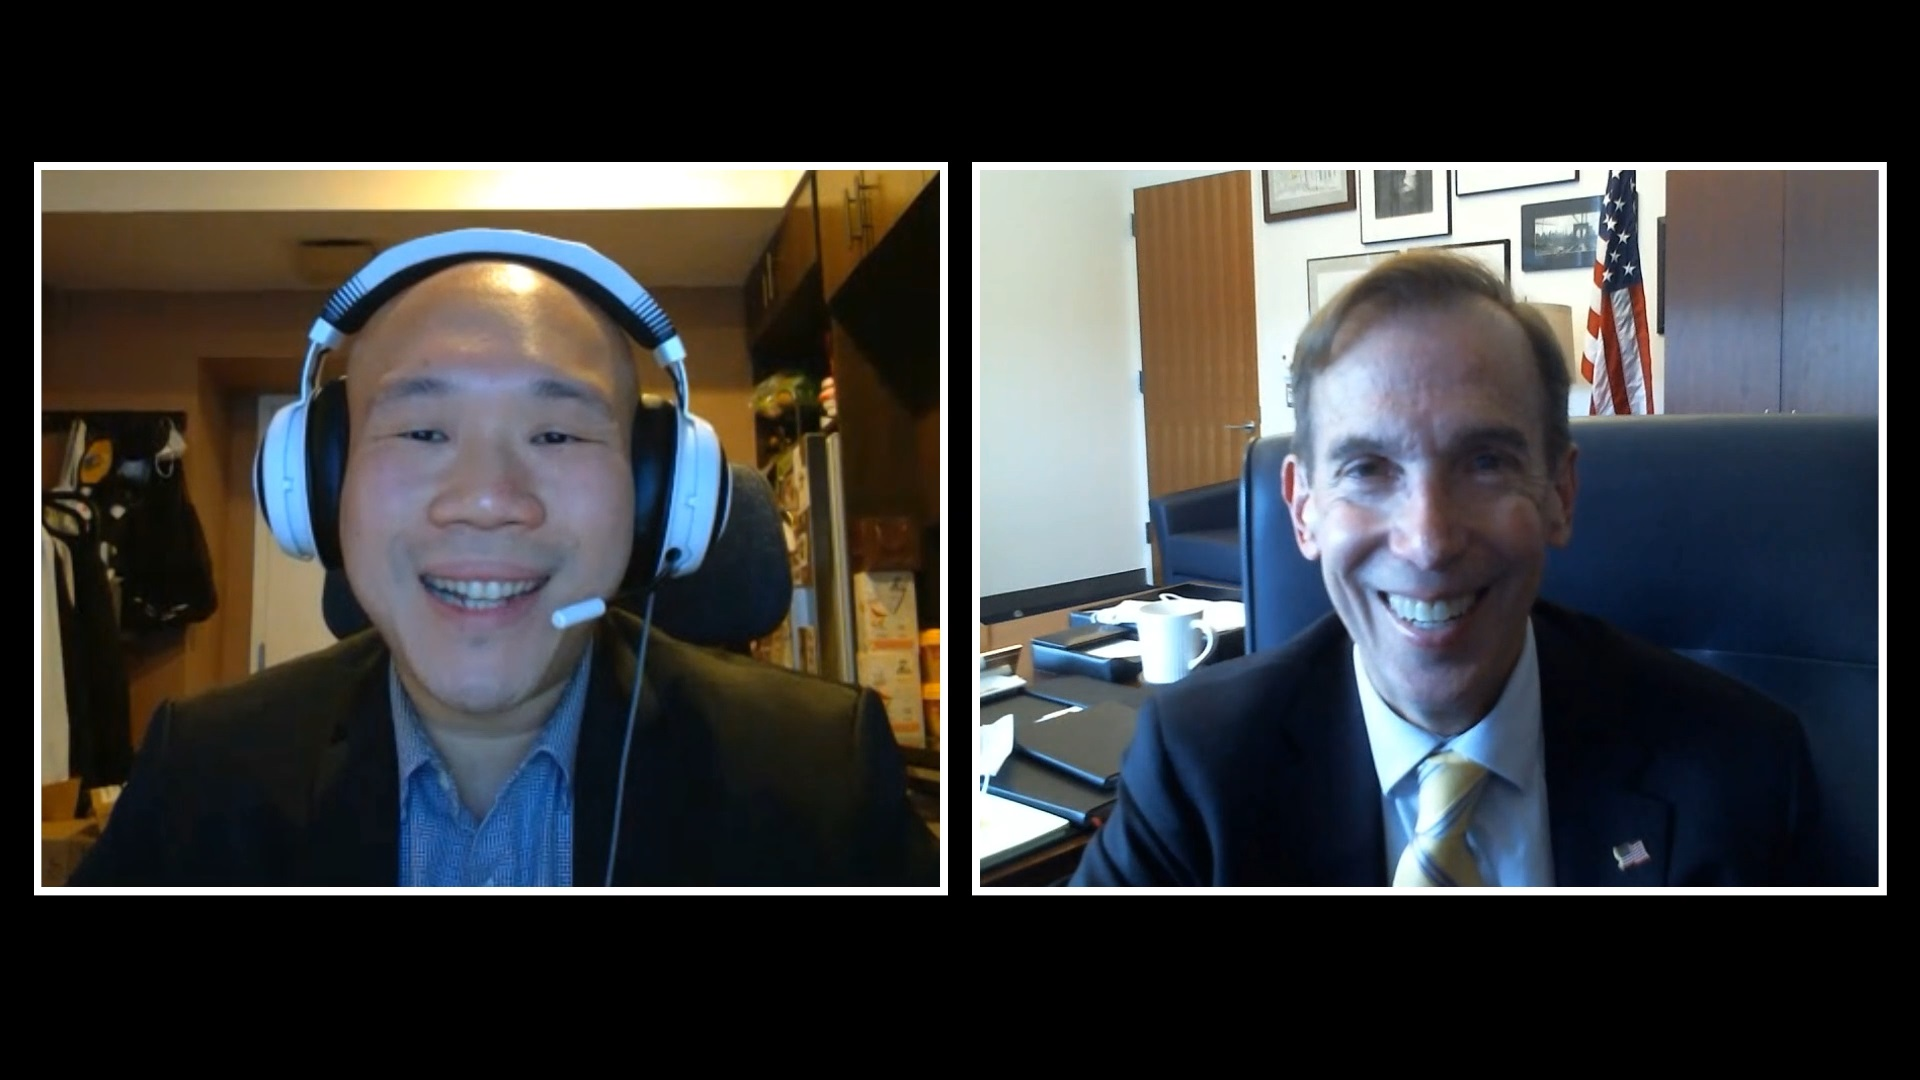 Interview with Hon. Ralph J. Porzio & Jacob Chen